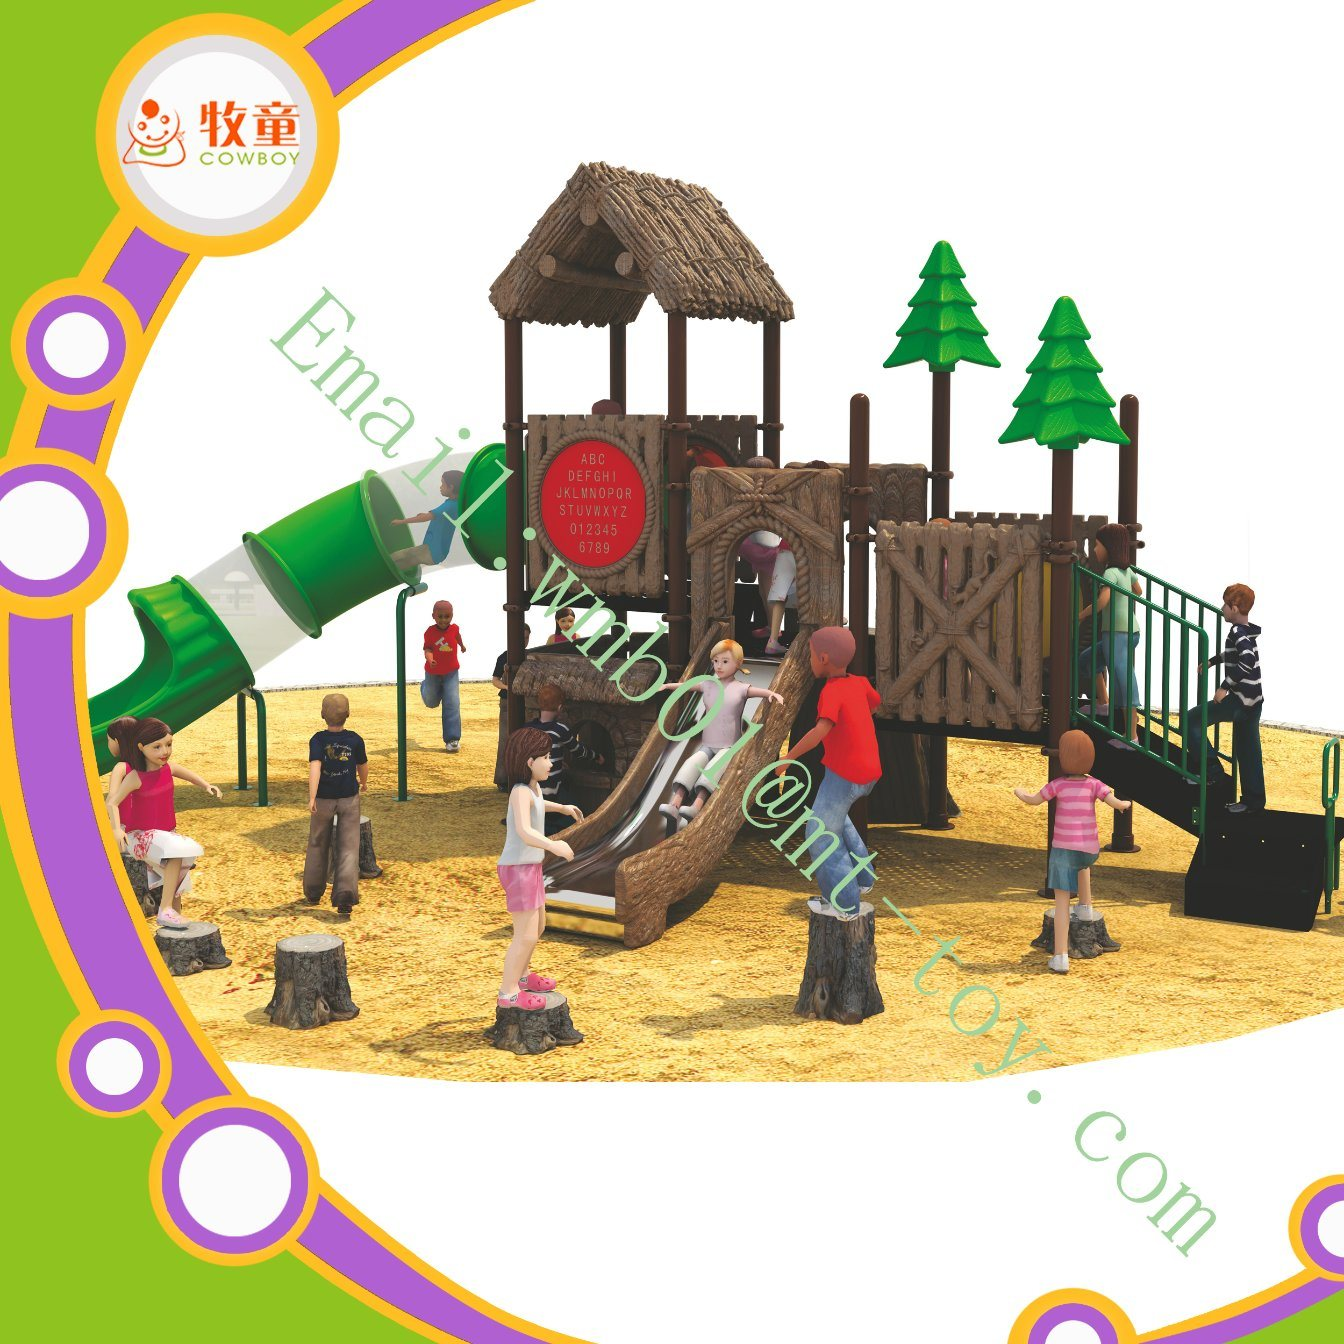 Amusement Park Big Playground Equipment Set for Kids to Play